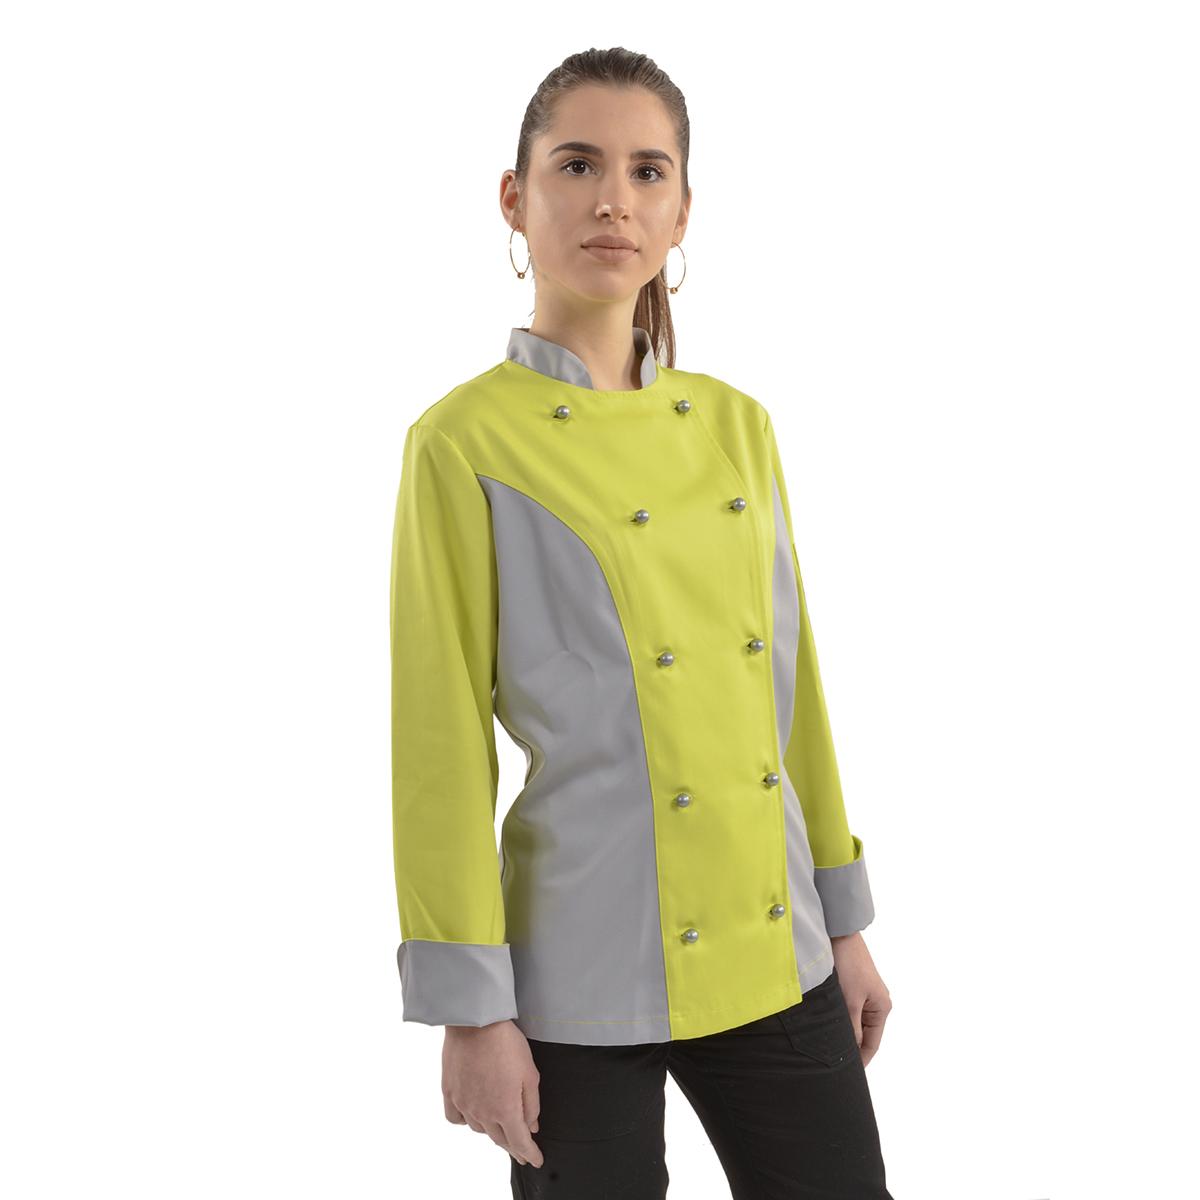 Ženske kuharske jakne CAPRICIOSA 1